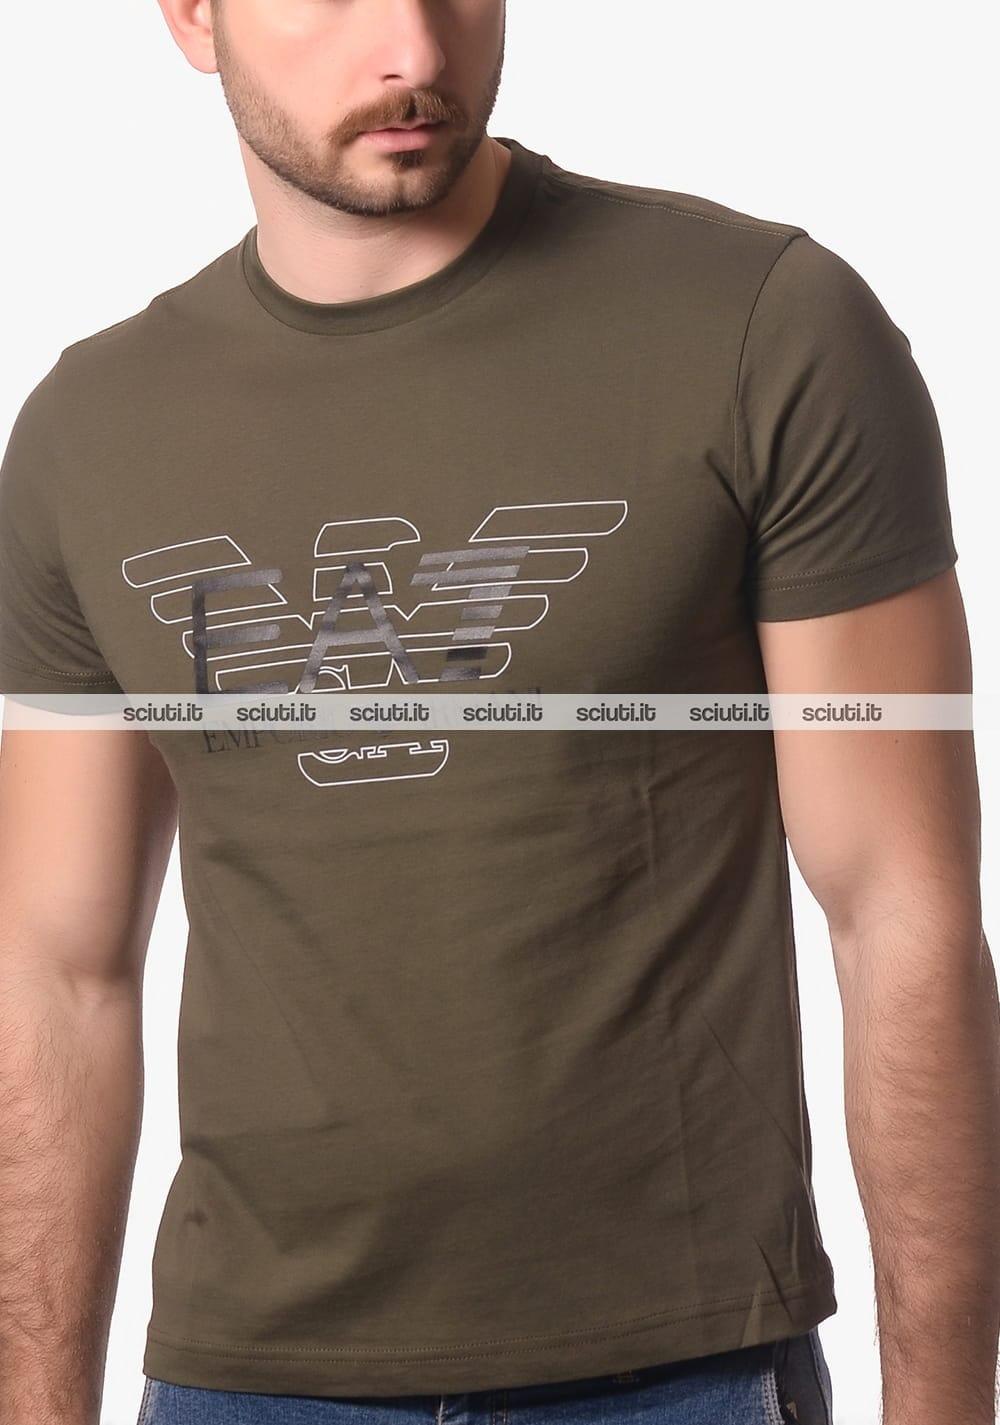 2b67007bea Tshirt EA7 uomo logo frontale verde militare   Sciuti.it